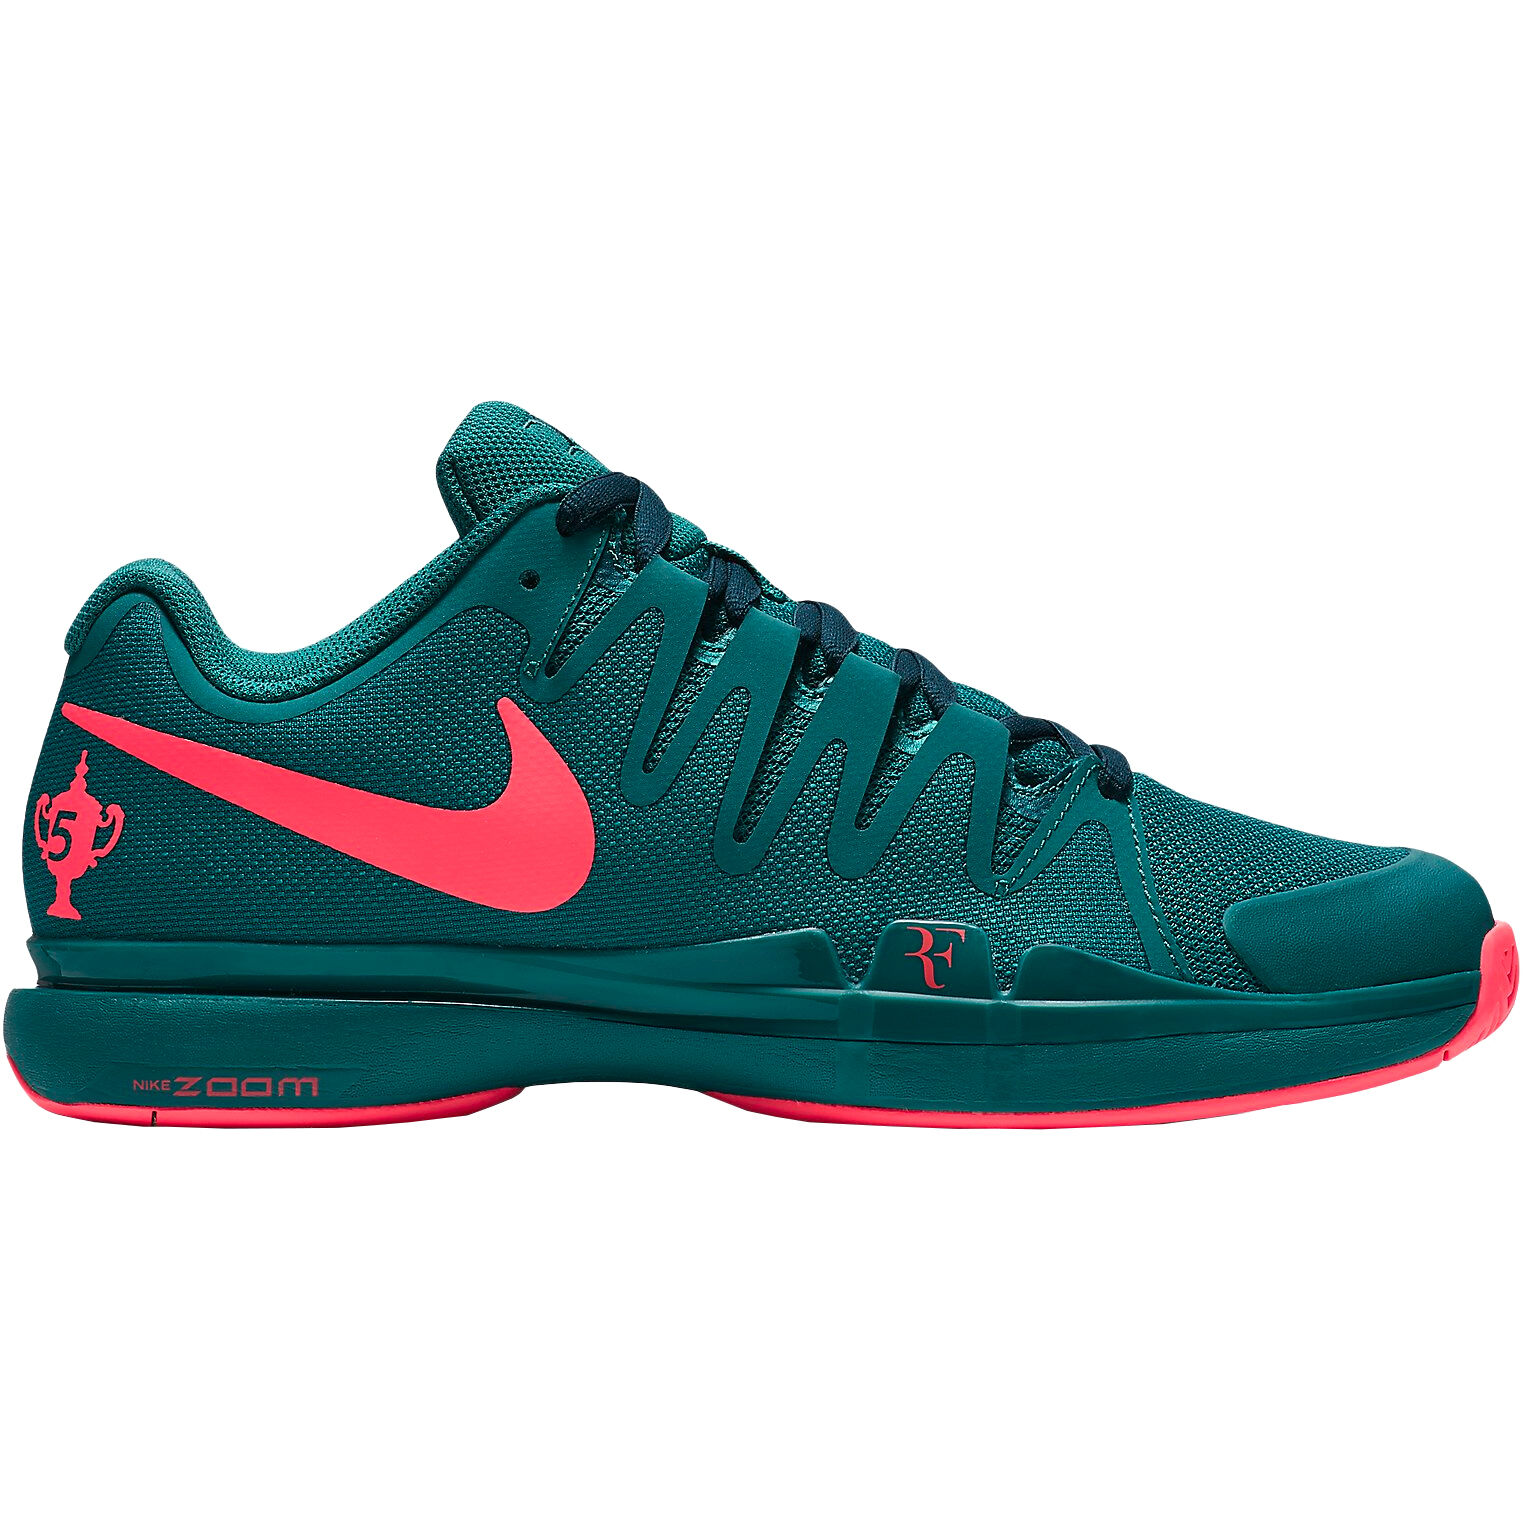 Nike Zoom Vapor 9.5 Tour LG Quickstrike Allcourt Schoen Limited Edition Heren Petrolblauw, Neonoranje